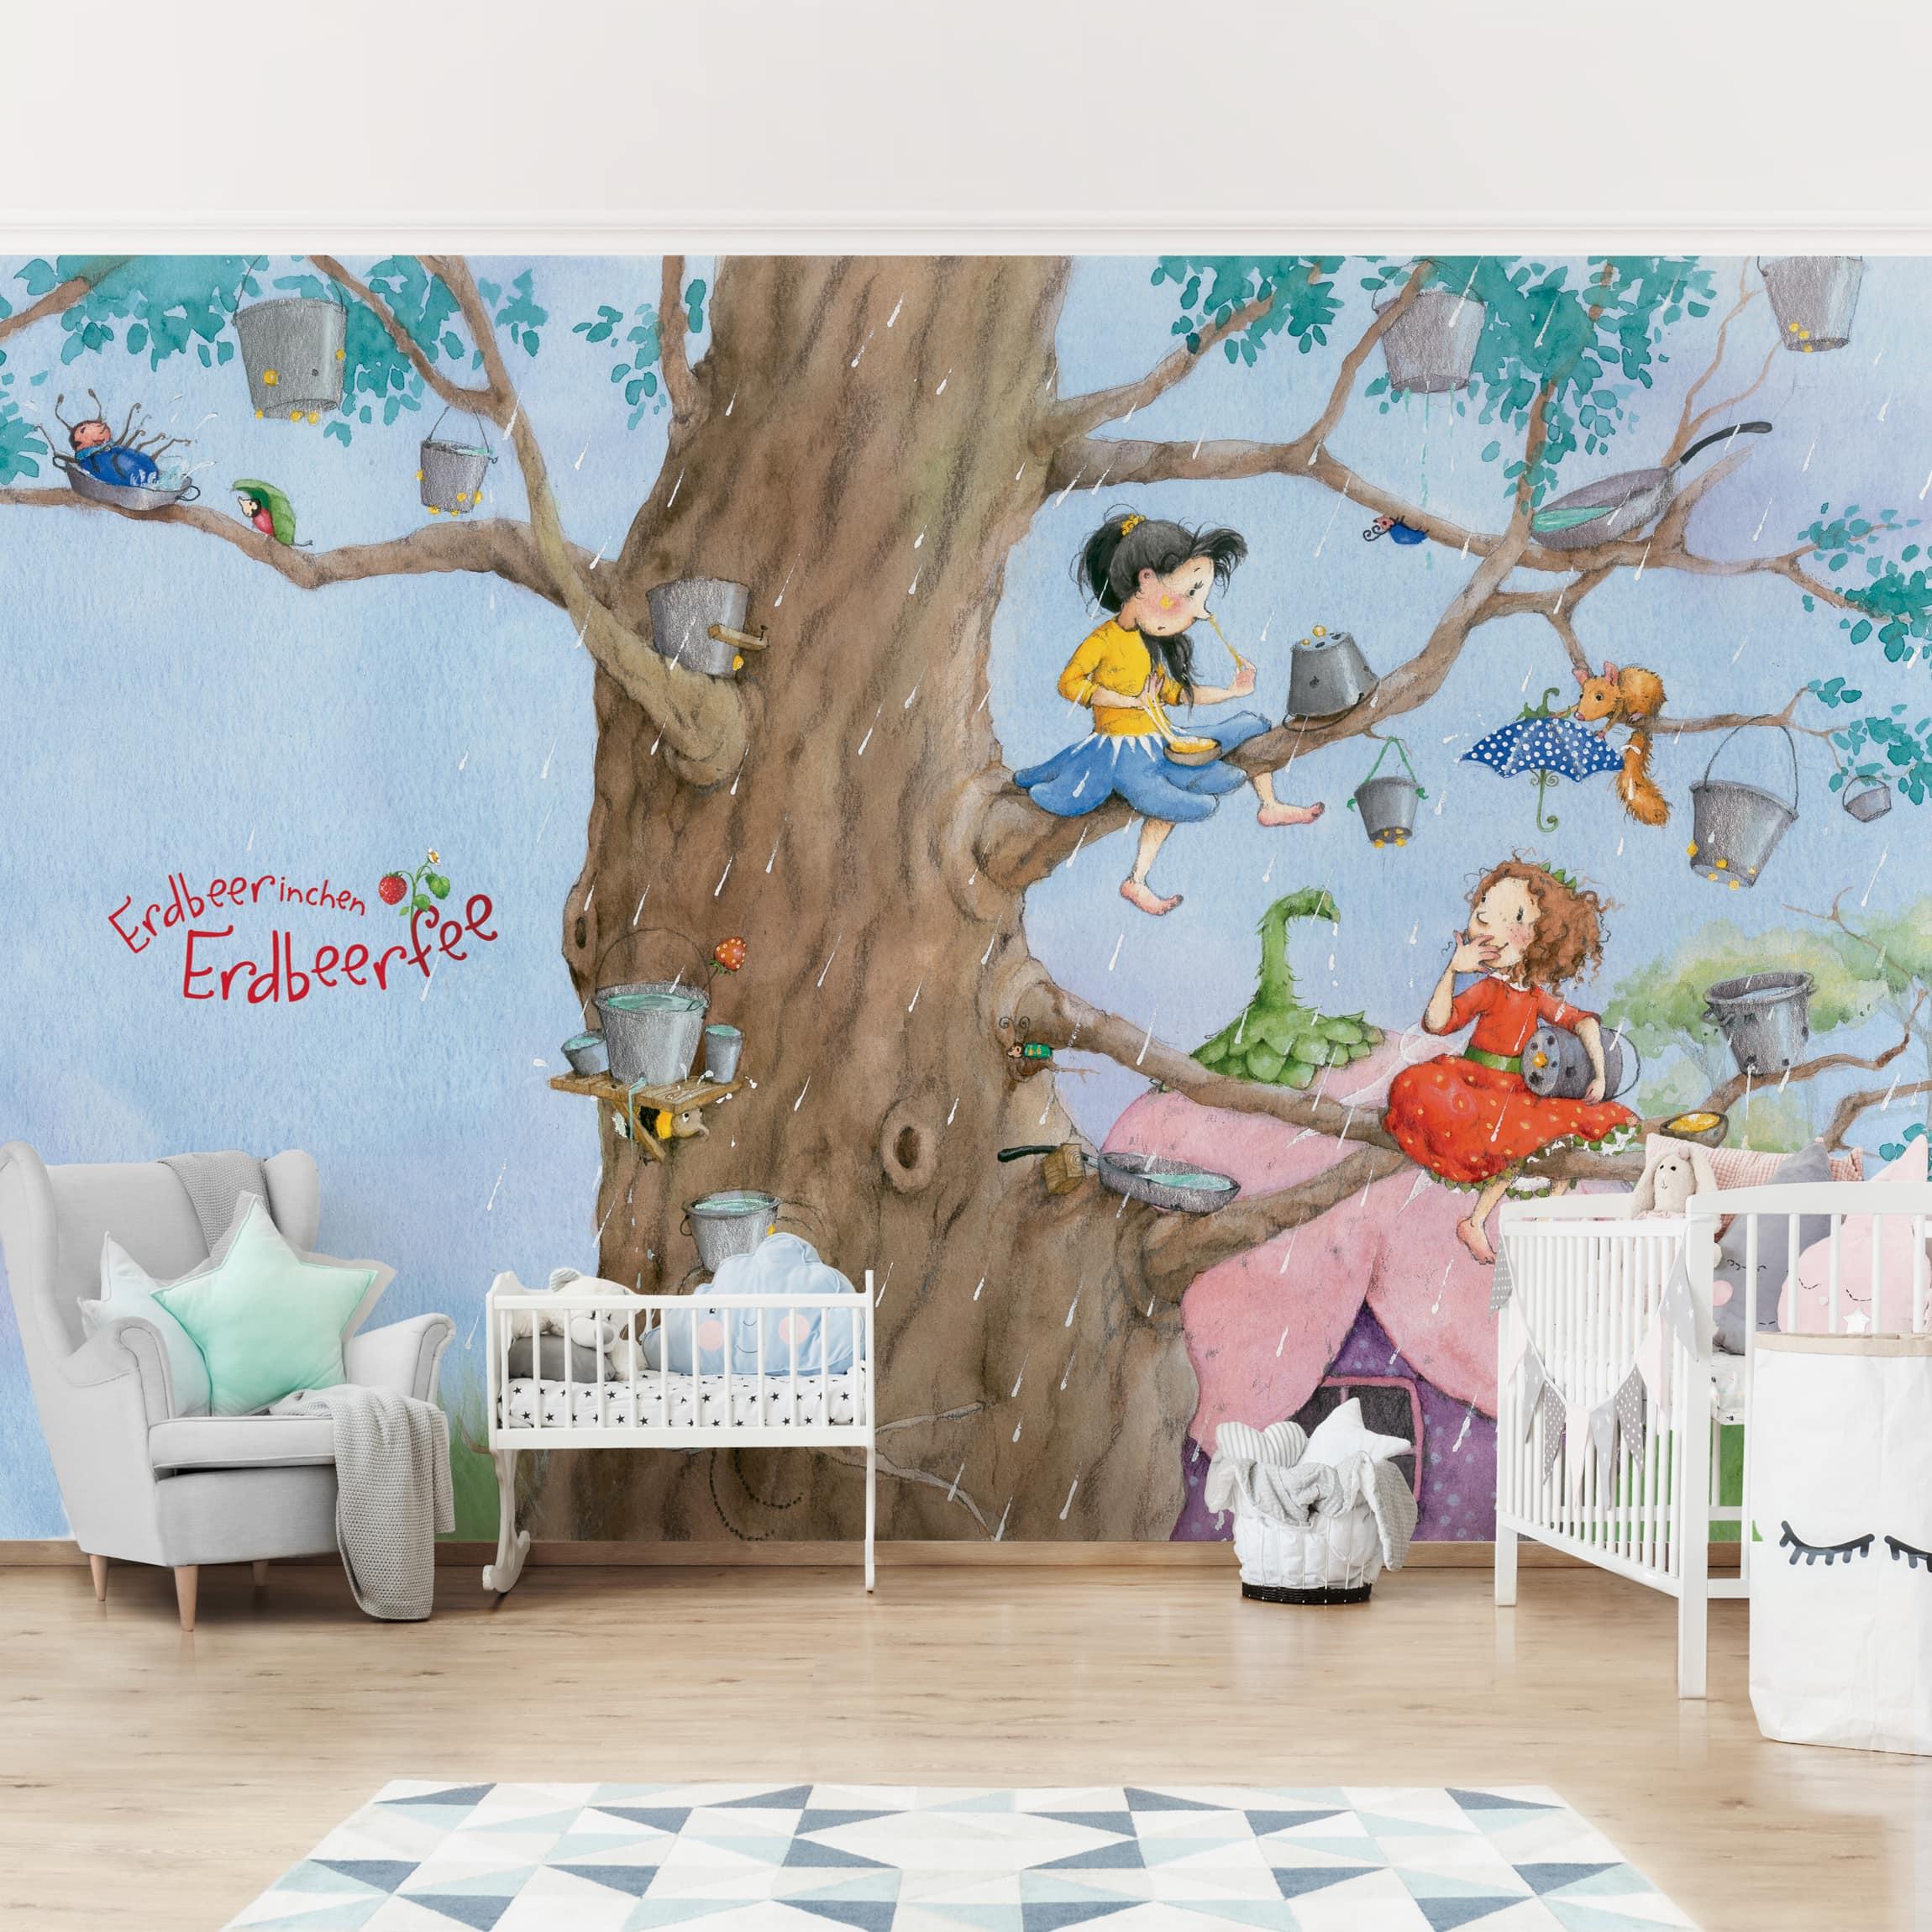 Selbstklebende Tapete Kinderzimmer - Erdbeerinchen Erdbeerfee - Es Regnet -  Fototapete Querformat